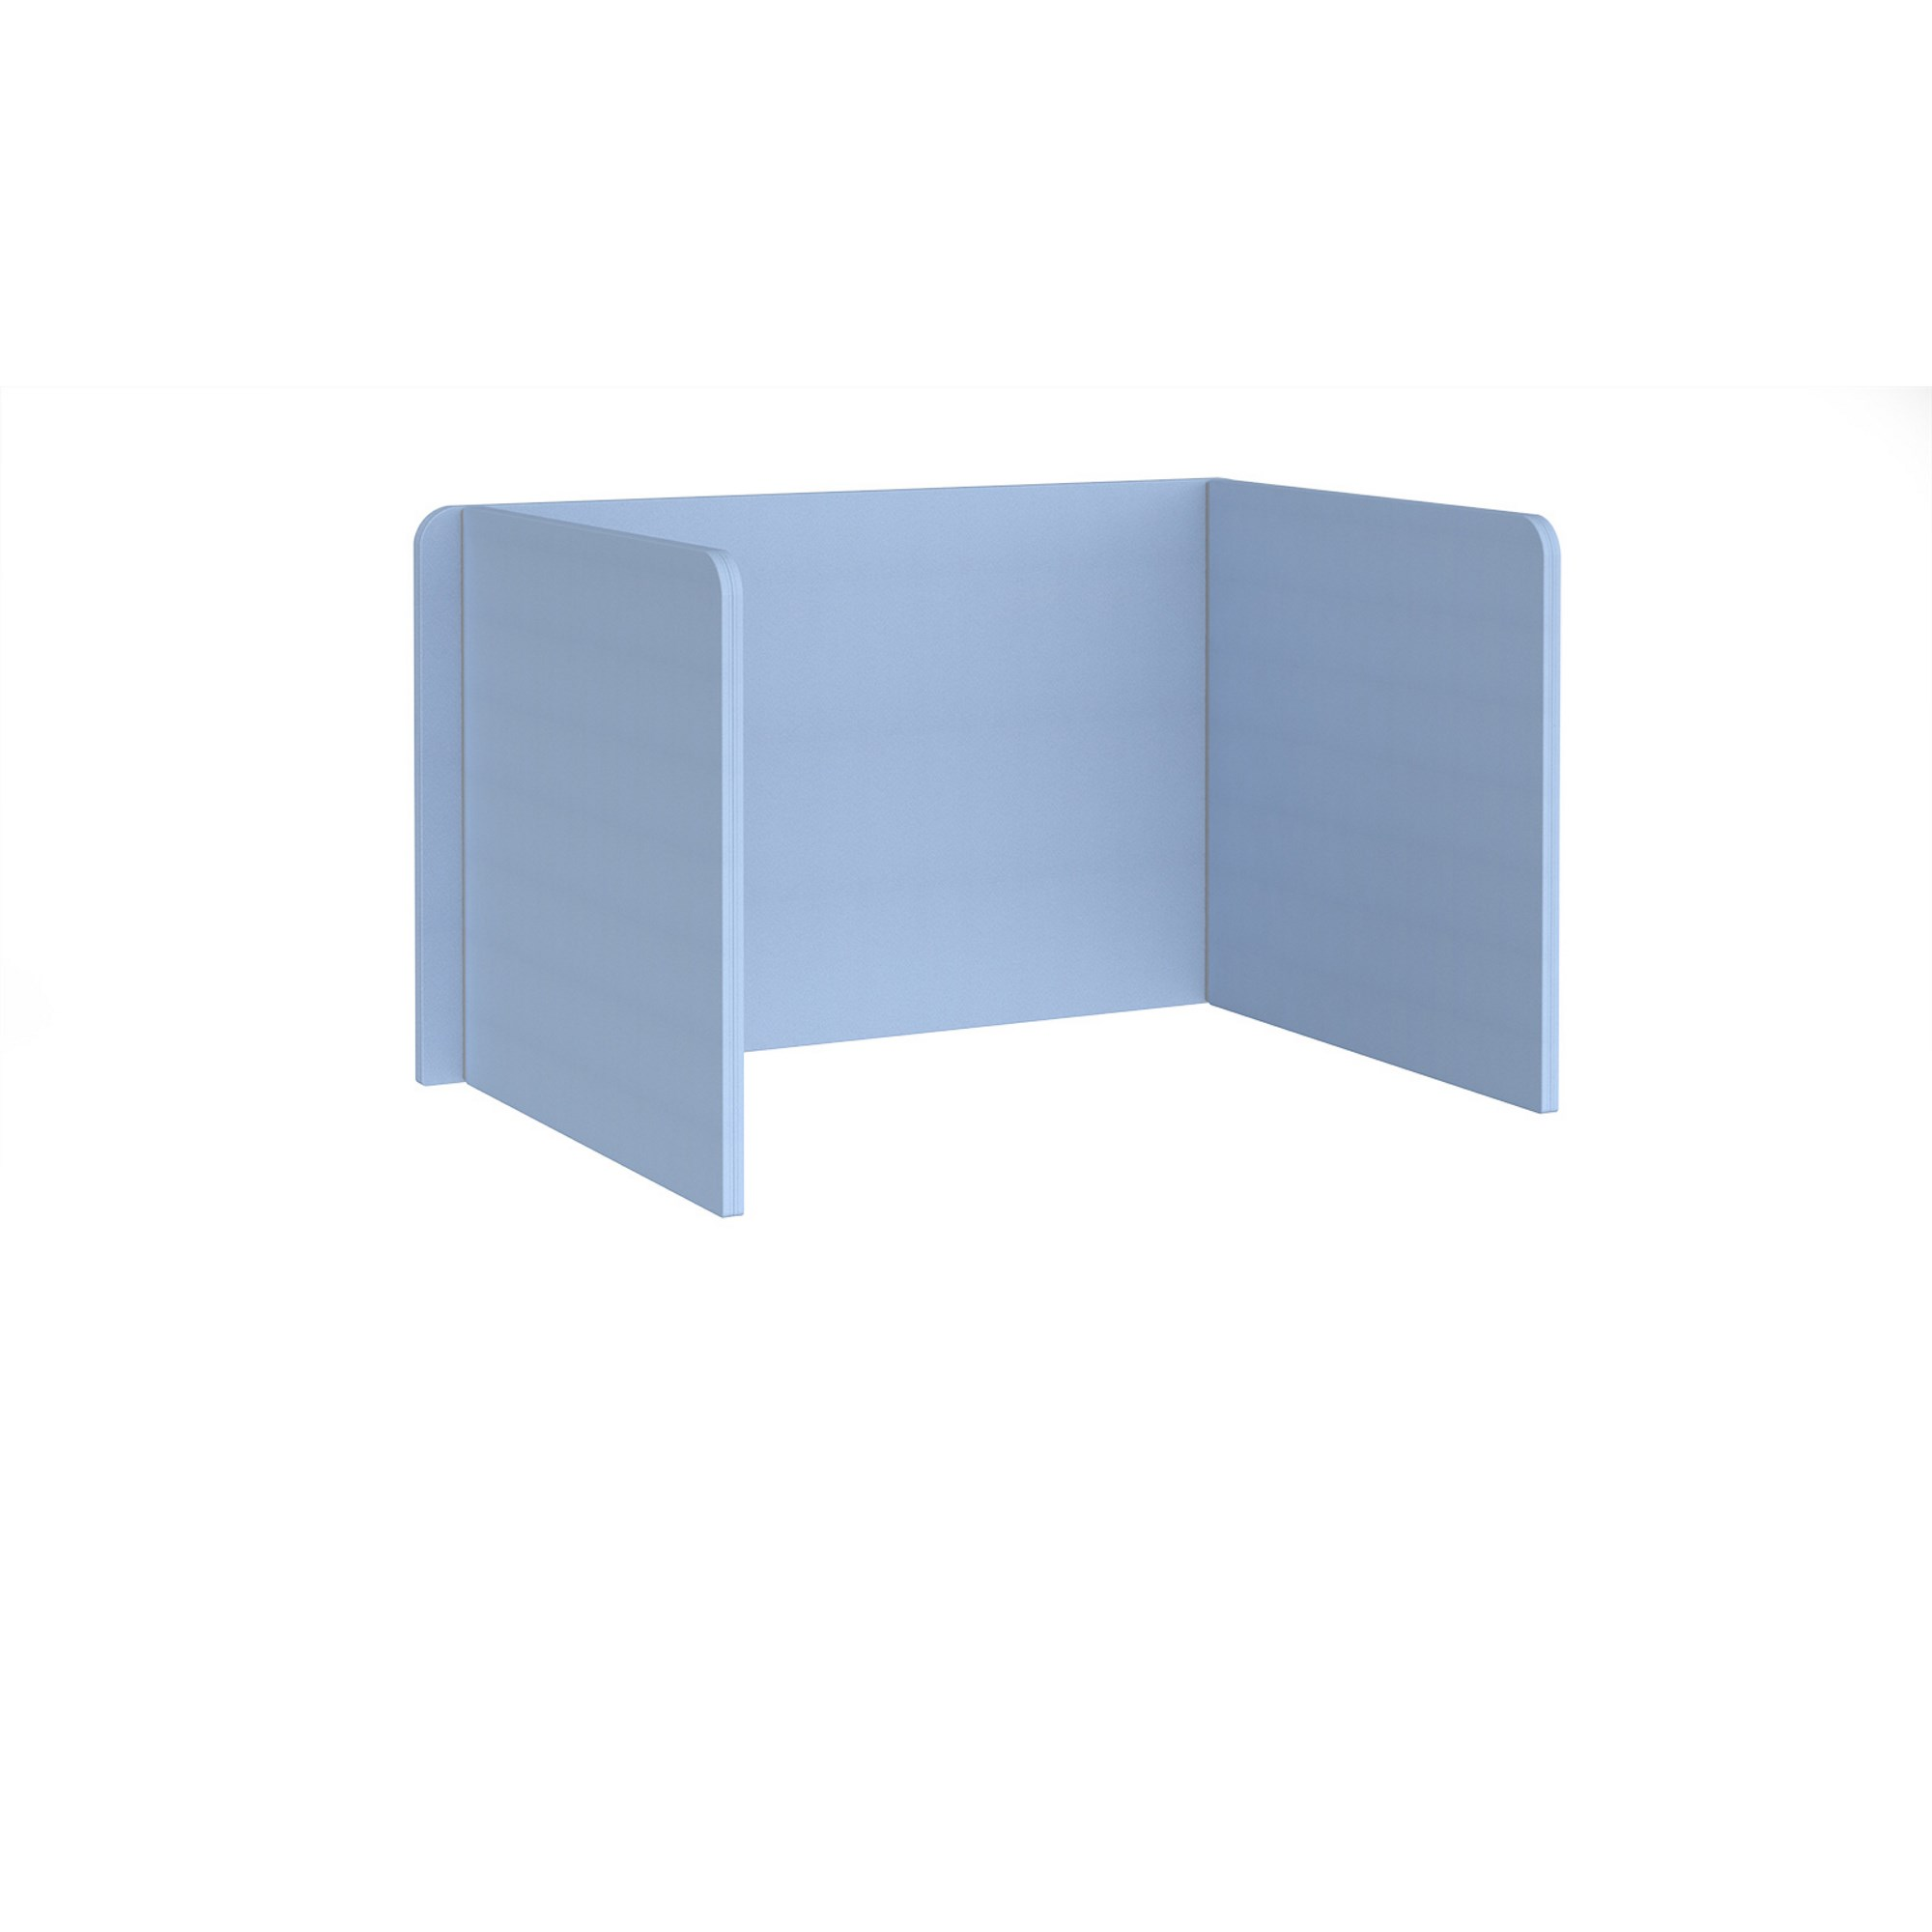 Fabric 3-sided High Screens 1185